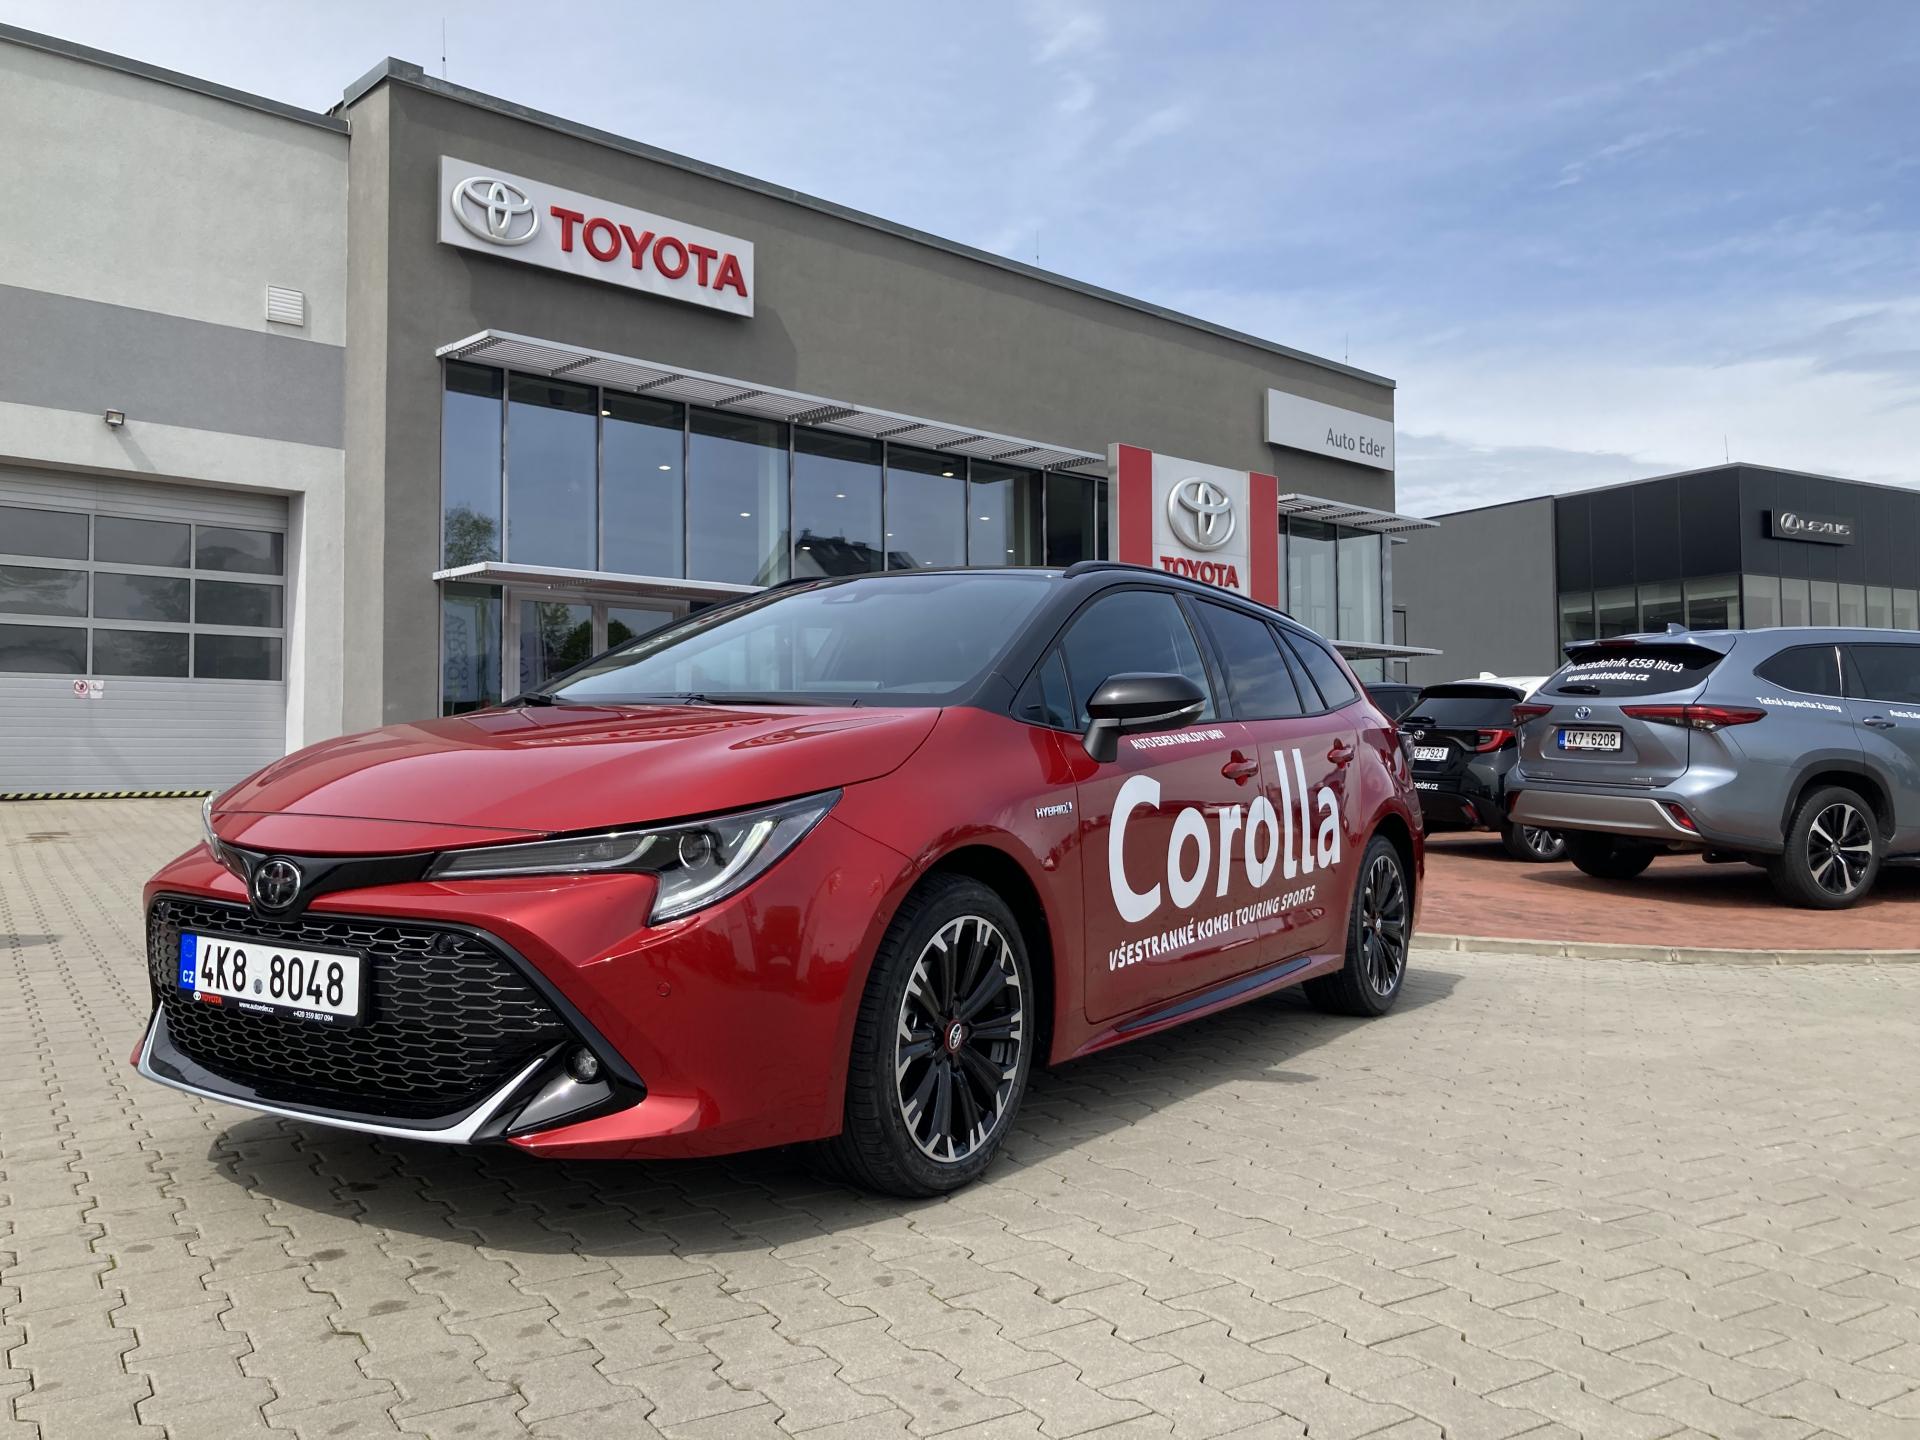 Toyota COROLLA Touring Sports 1,8 Hybrid (122 k) aut. e-CVT GR Sport